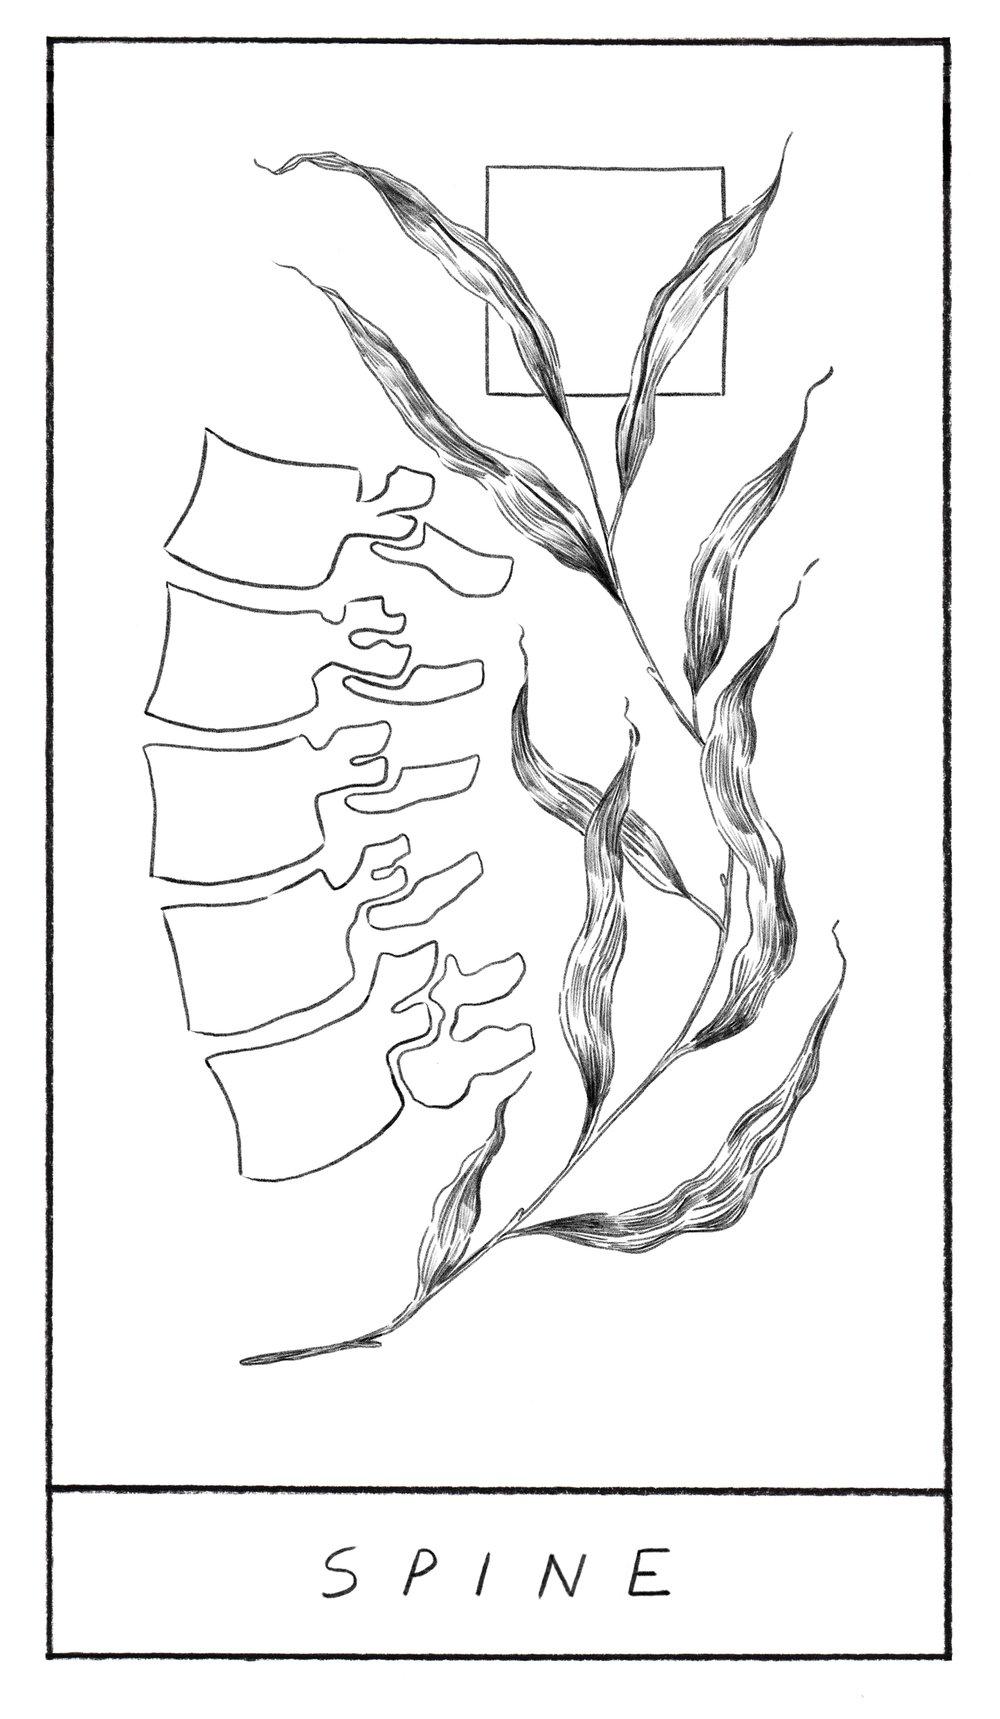 Spine_Final.jpg